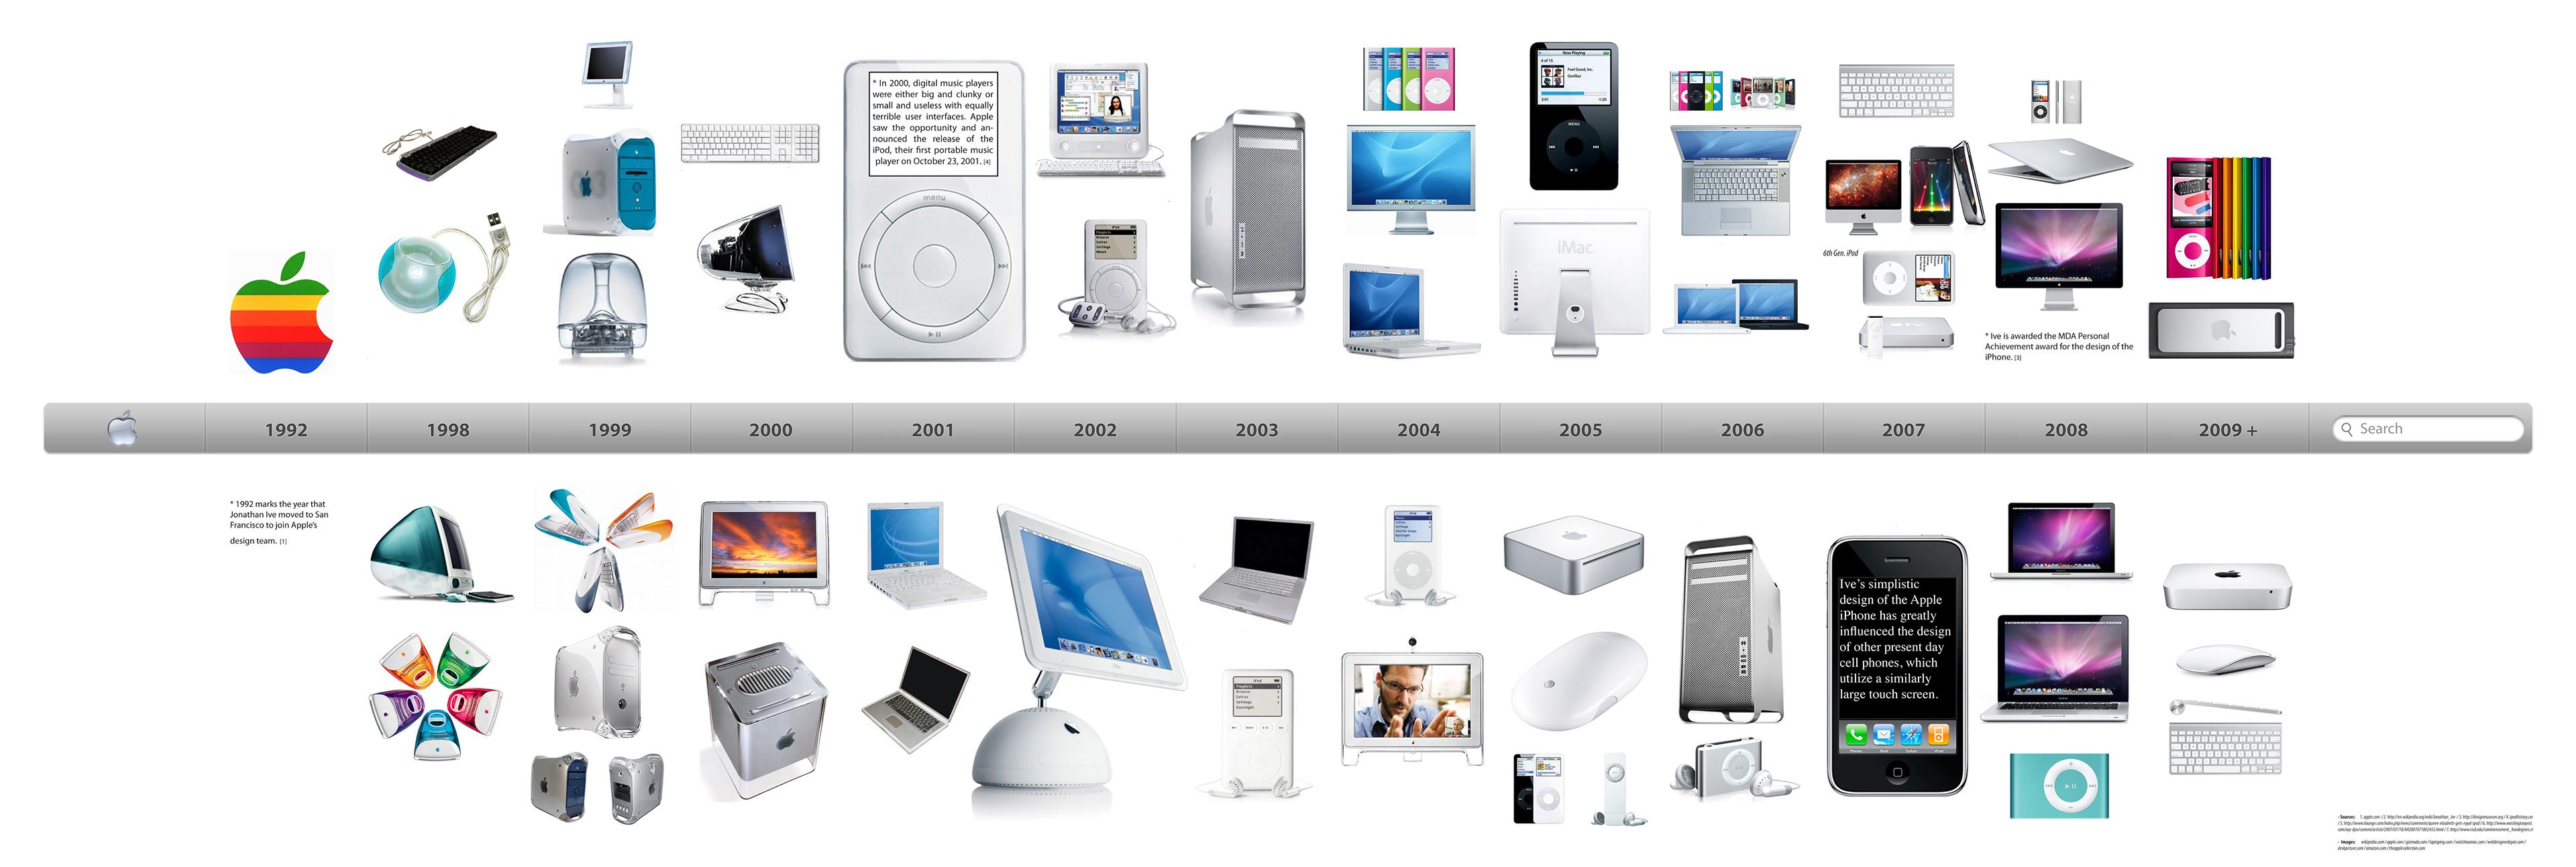 Torrey Anderson's Portfolio - Apple Product Design Timeline